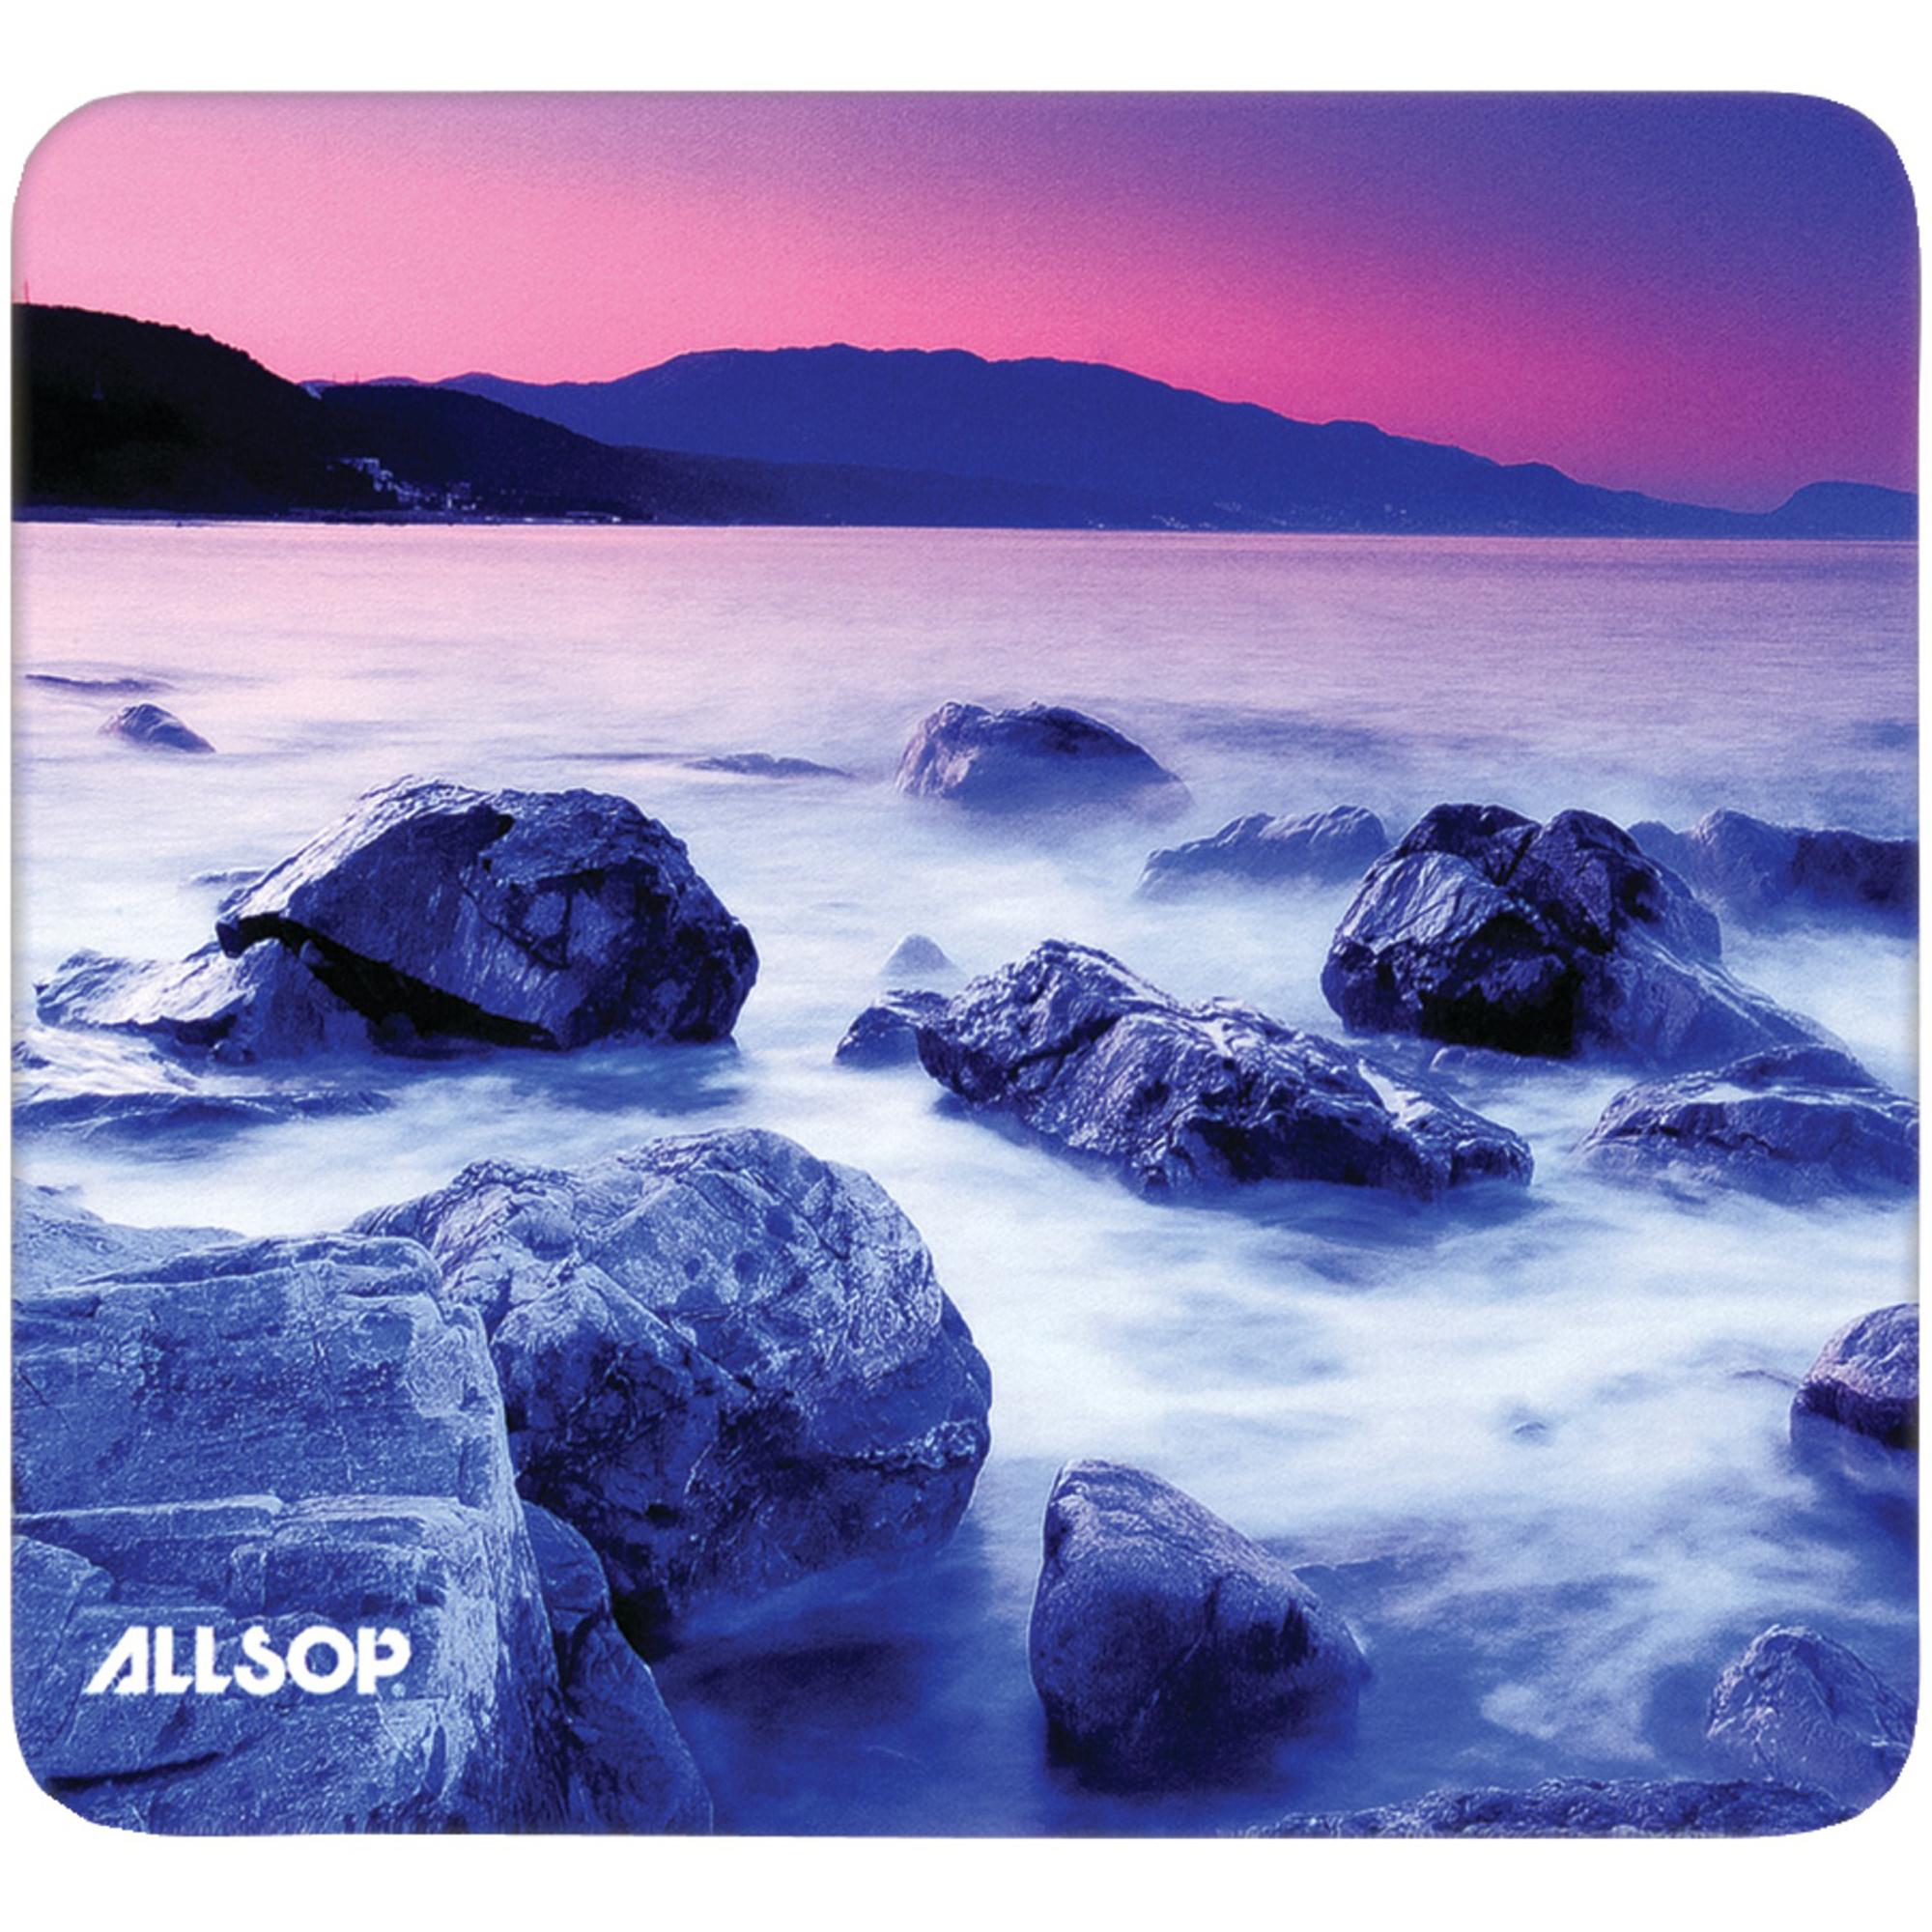 Allsop 30867 NatureSmart Mouse Pad